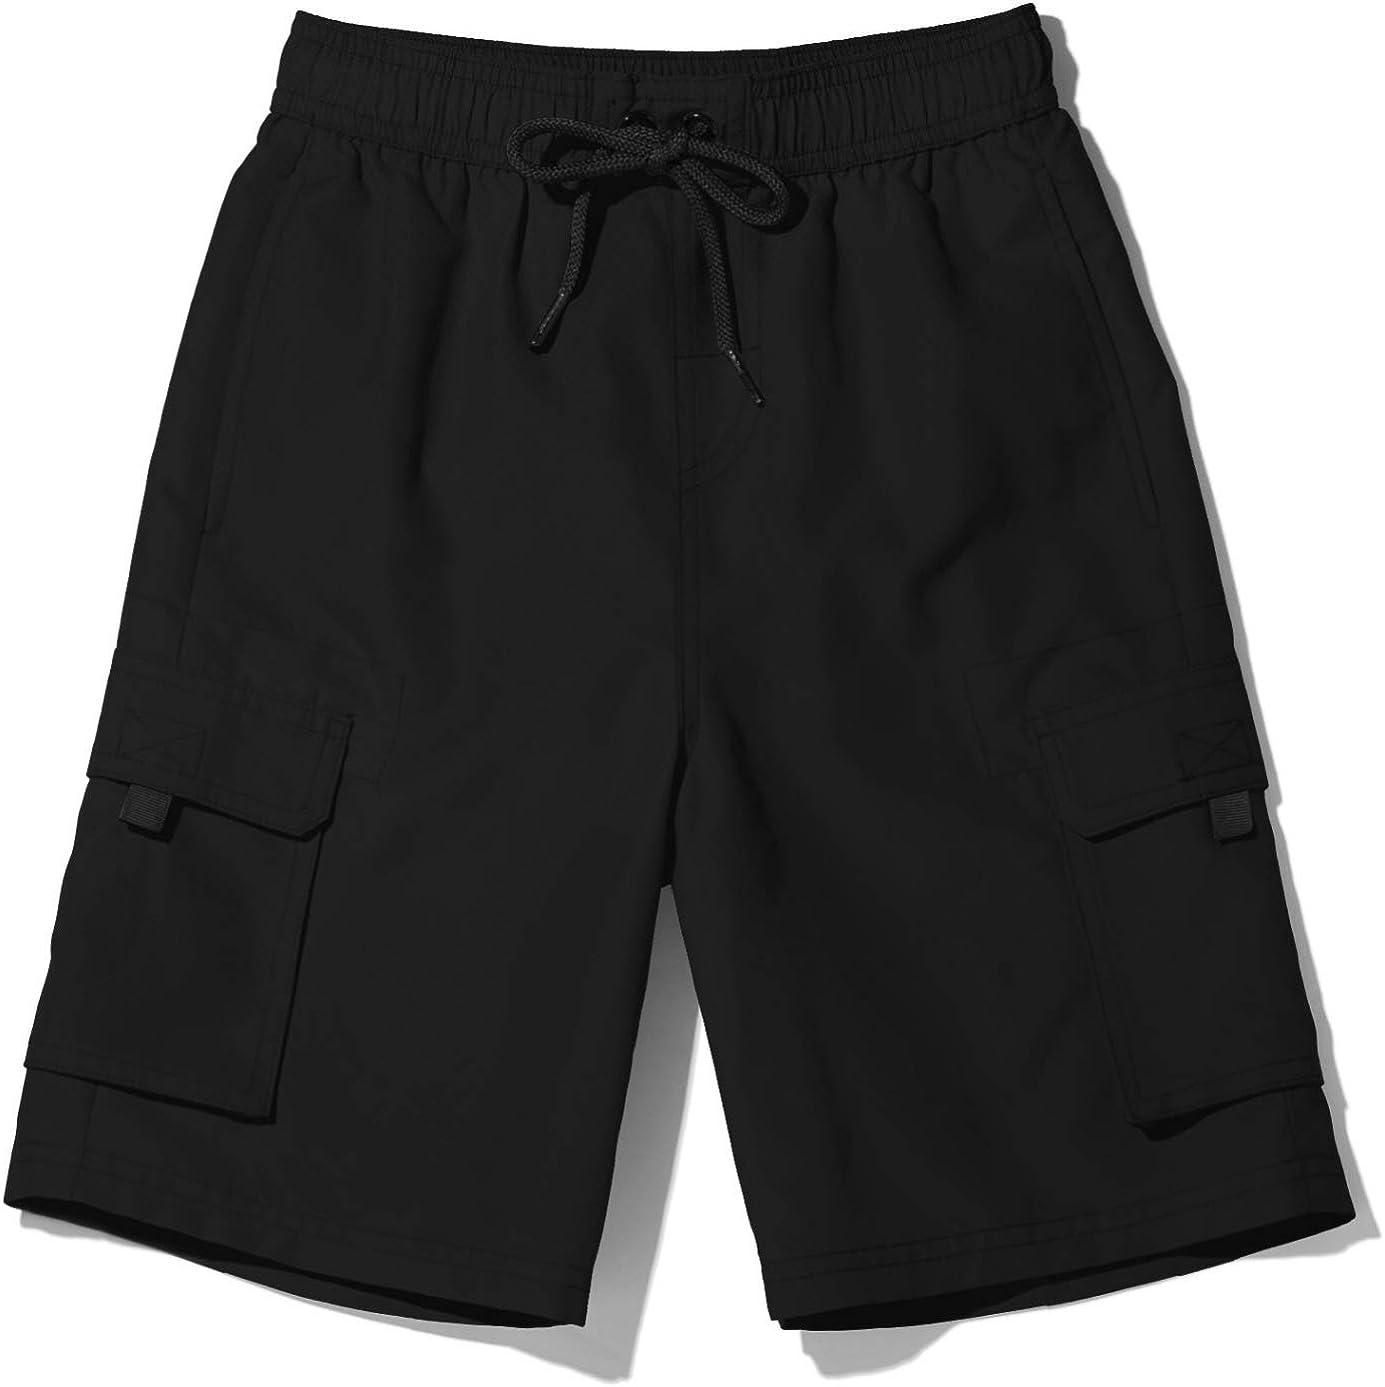 Swimsuit Swimwear with Inner Mesh Liner Beach Board Swim Shorts TSLA Boys Swim Trunks Quick Dry UPF 50